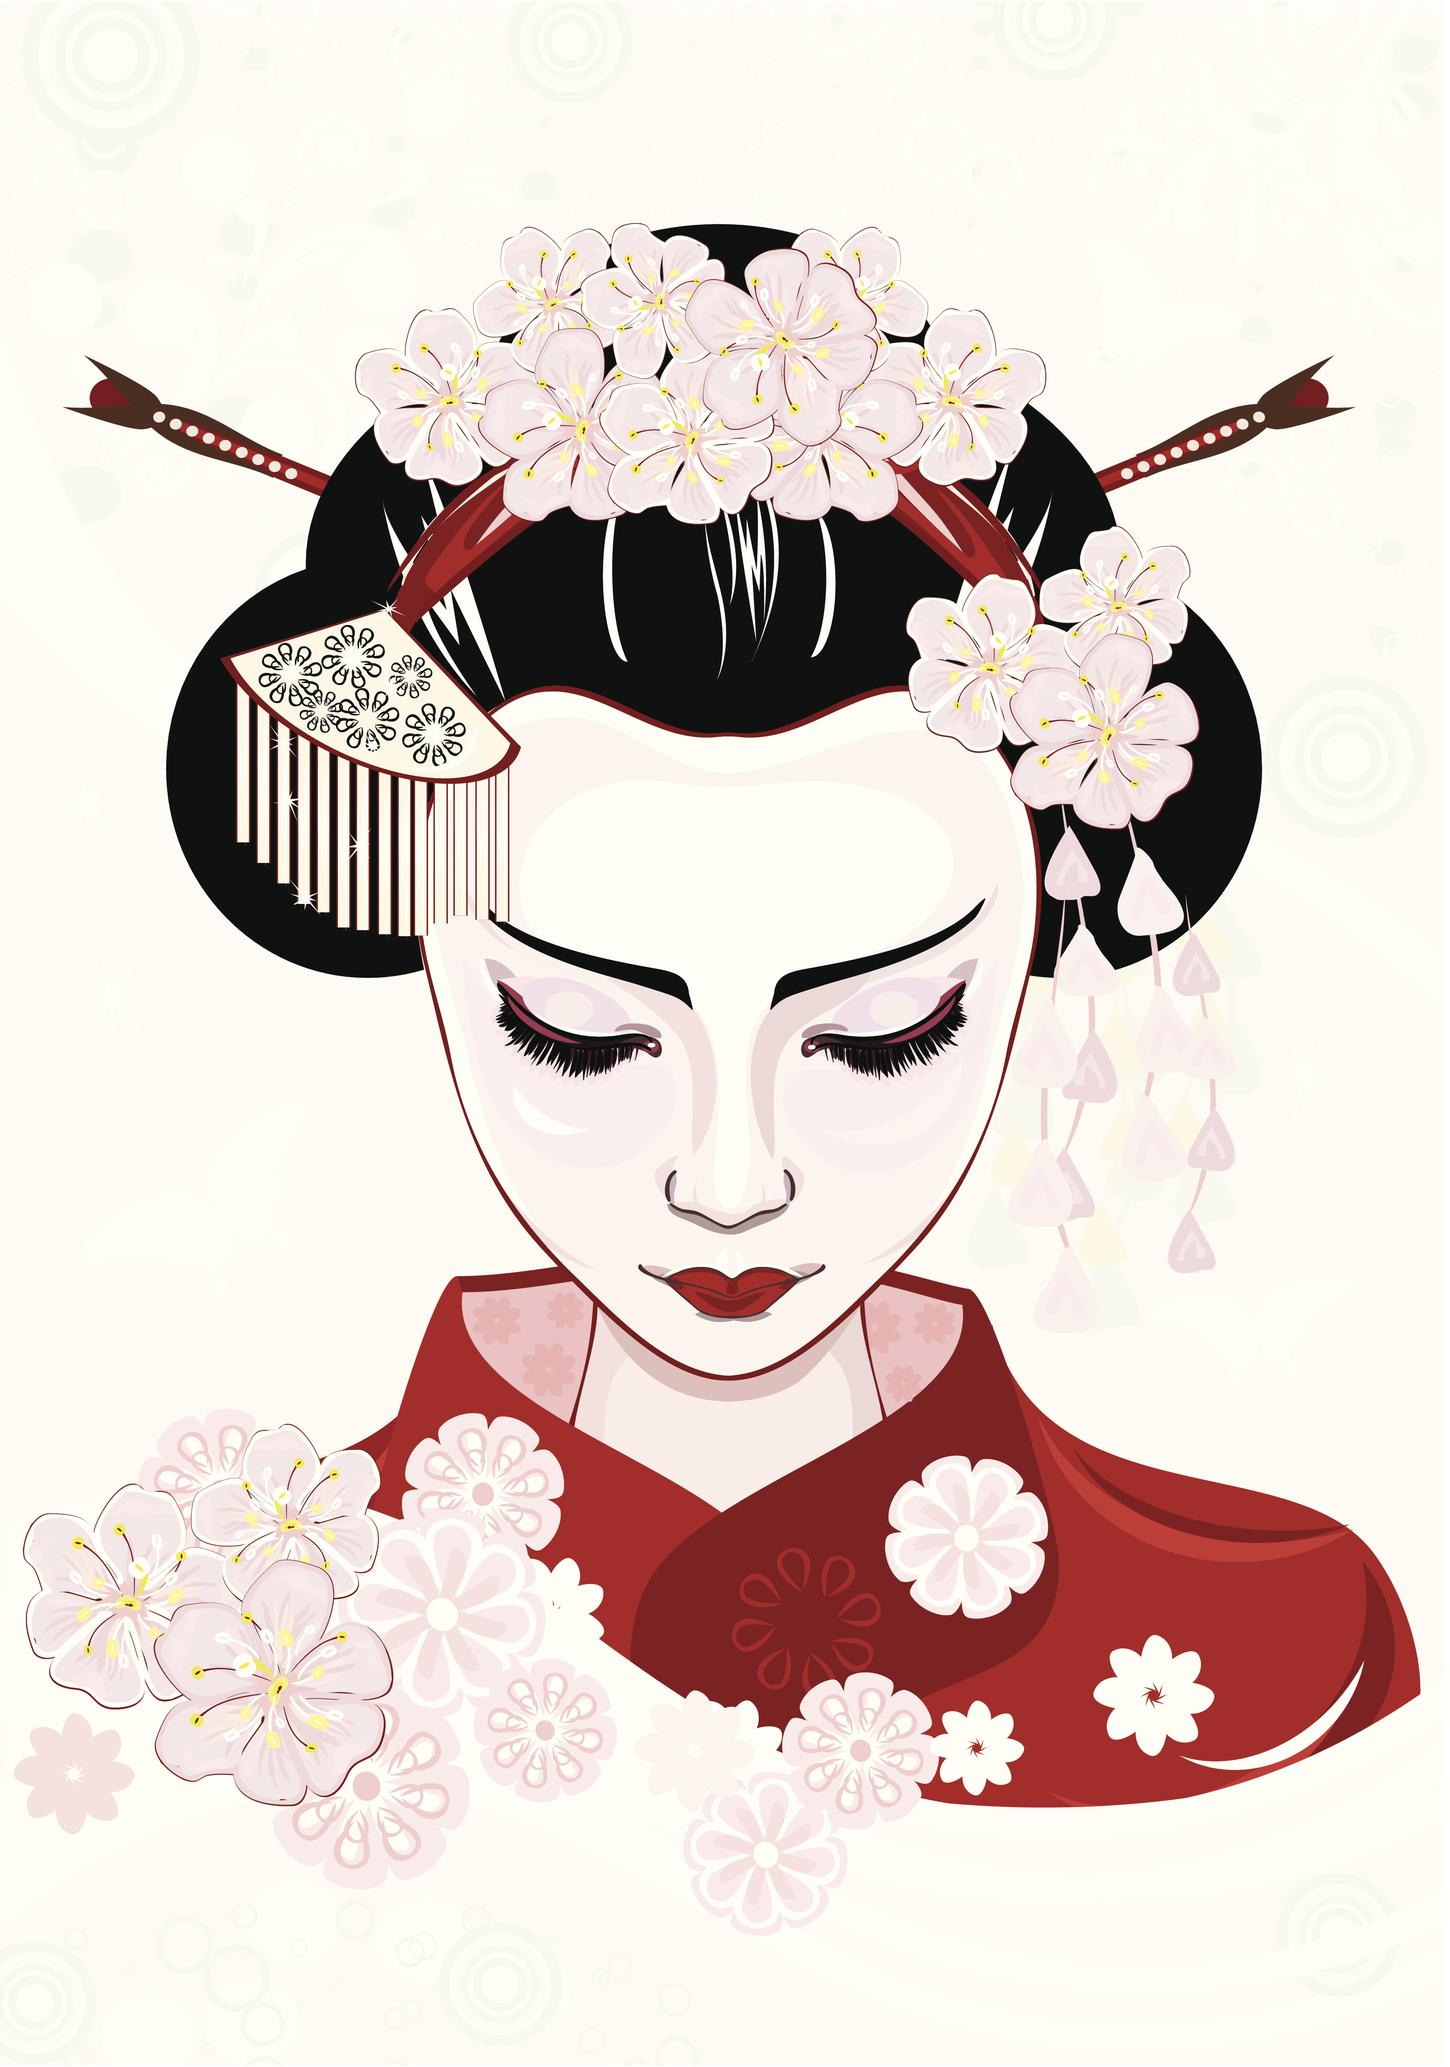 geisha tattoo bedeutung und motivideen. Black Bedroom Furniture Sets. Home Design Ideas